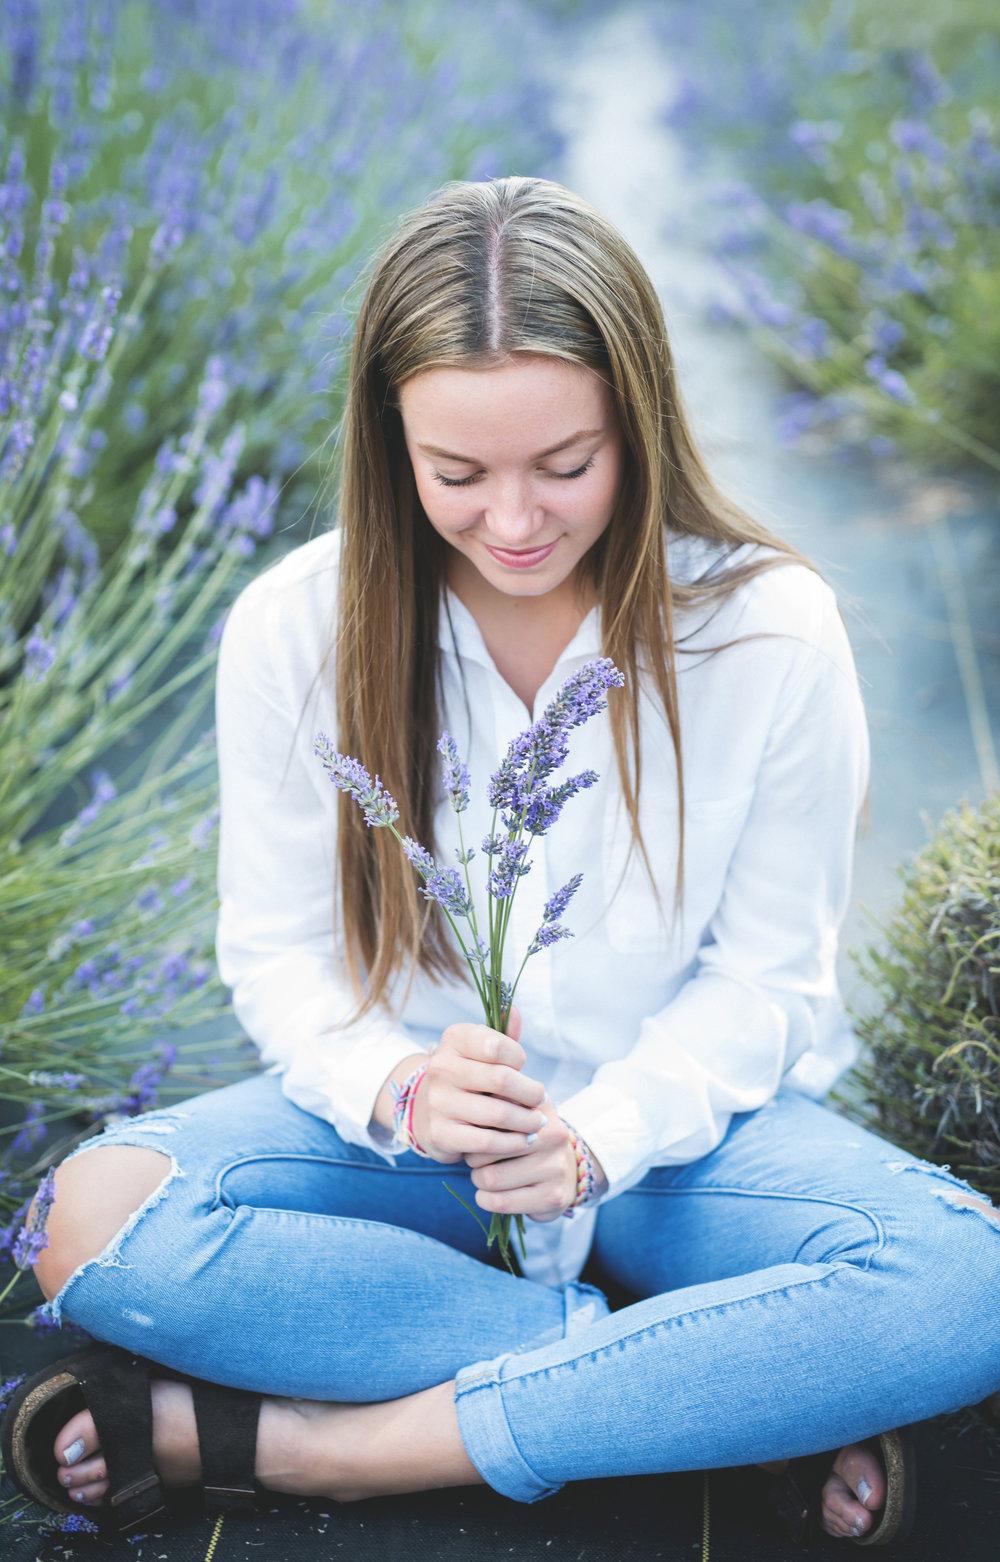 kristin grover images snofalls lavender field, sarah, senior model team. Mt. Si high school